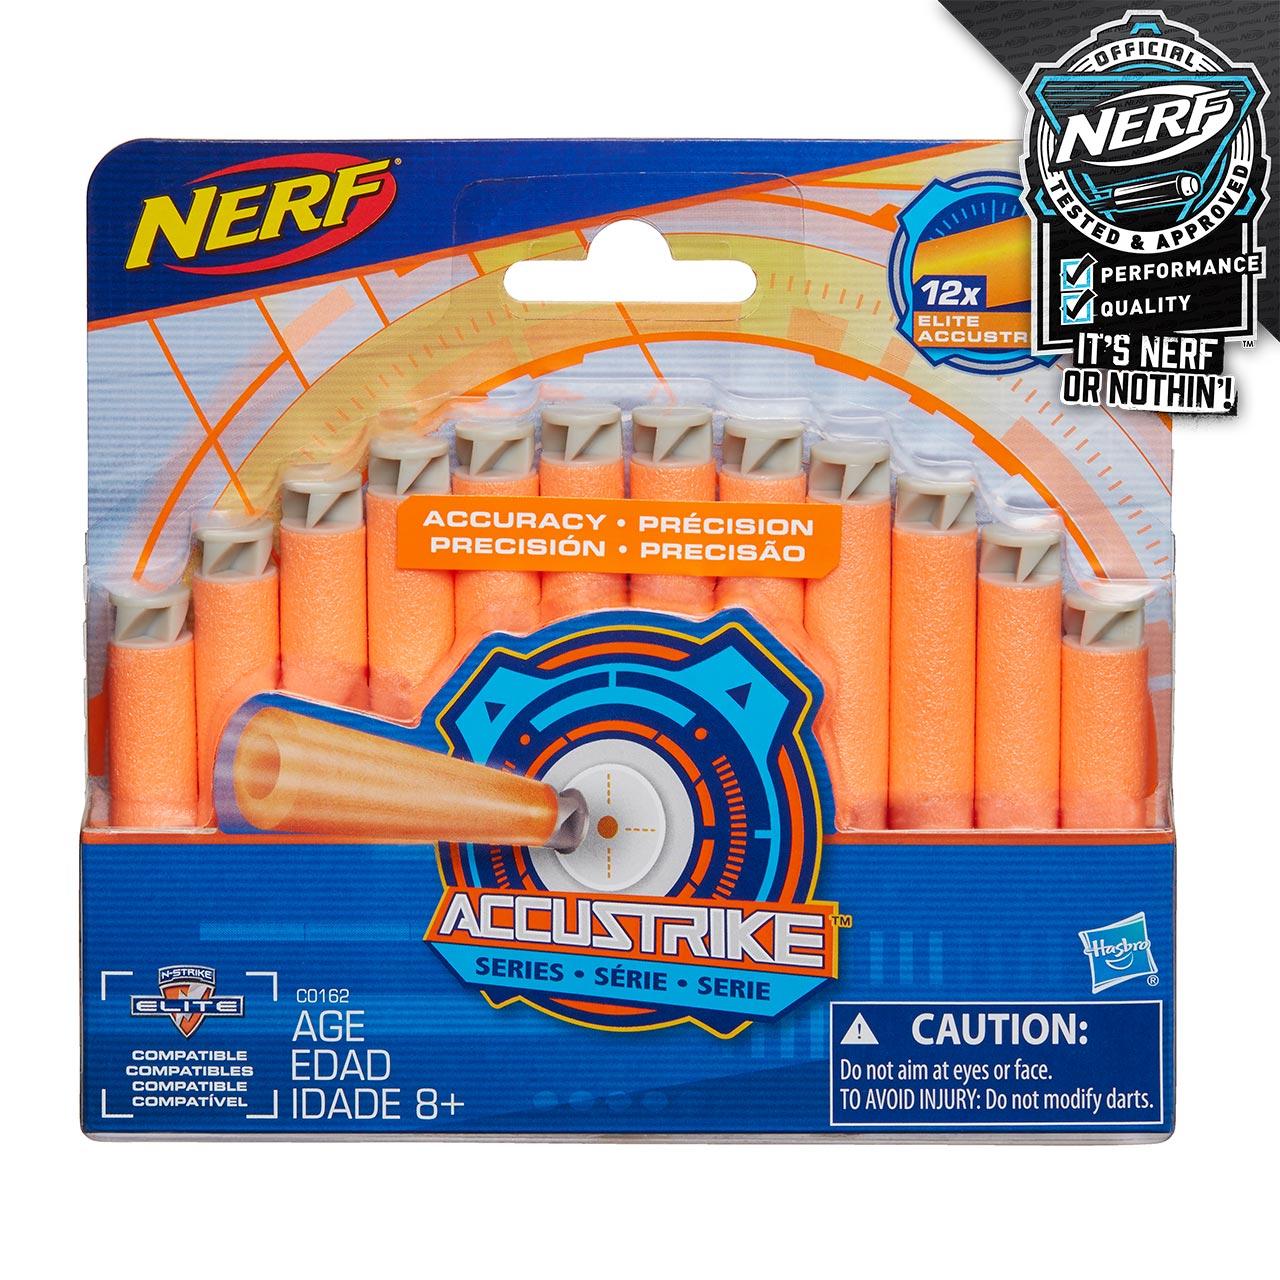 Nerf Accustrike šipky 12 ks